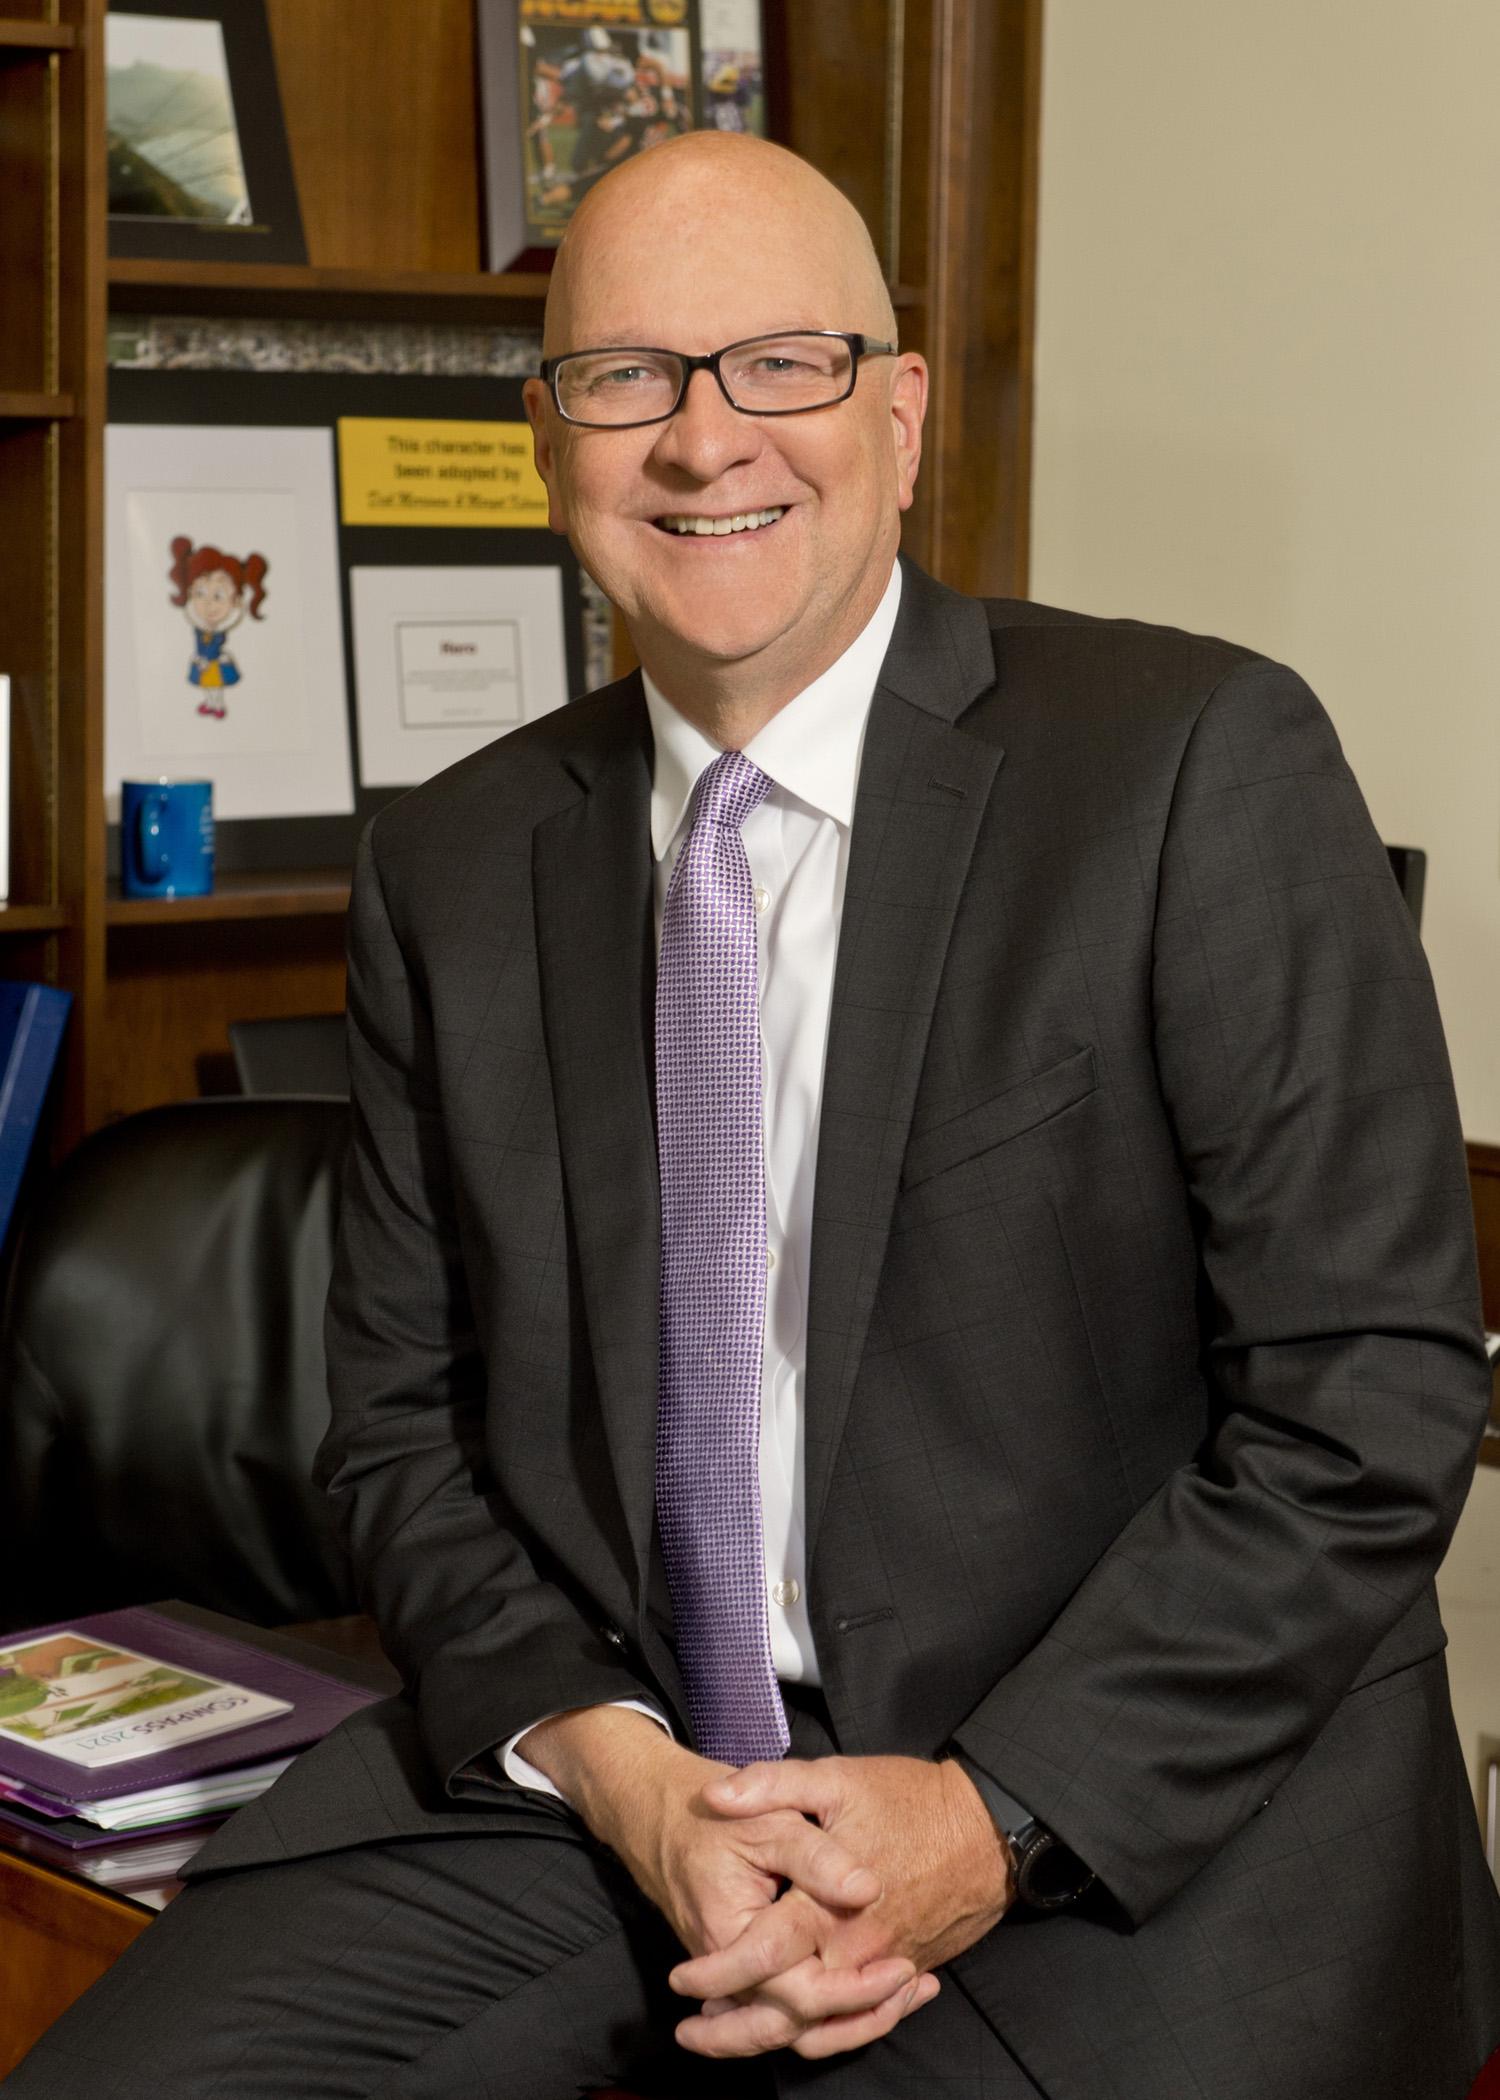 Richard Merriman Jr. is the former president of the University of Mount Union.